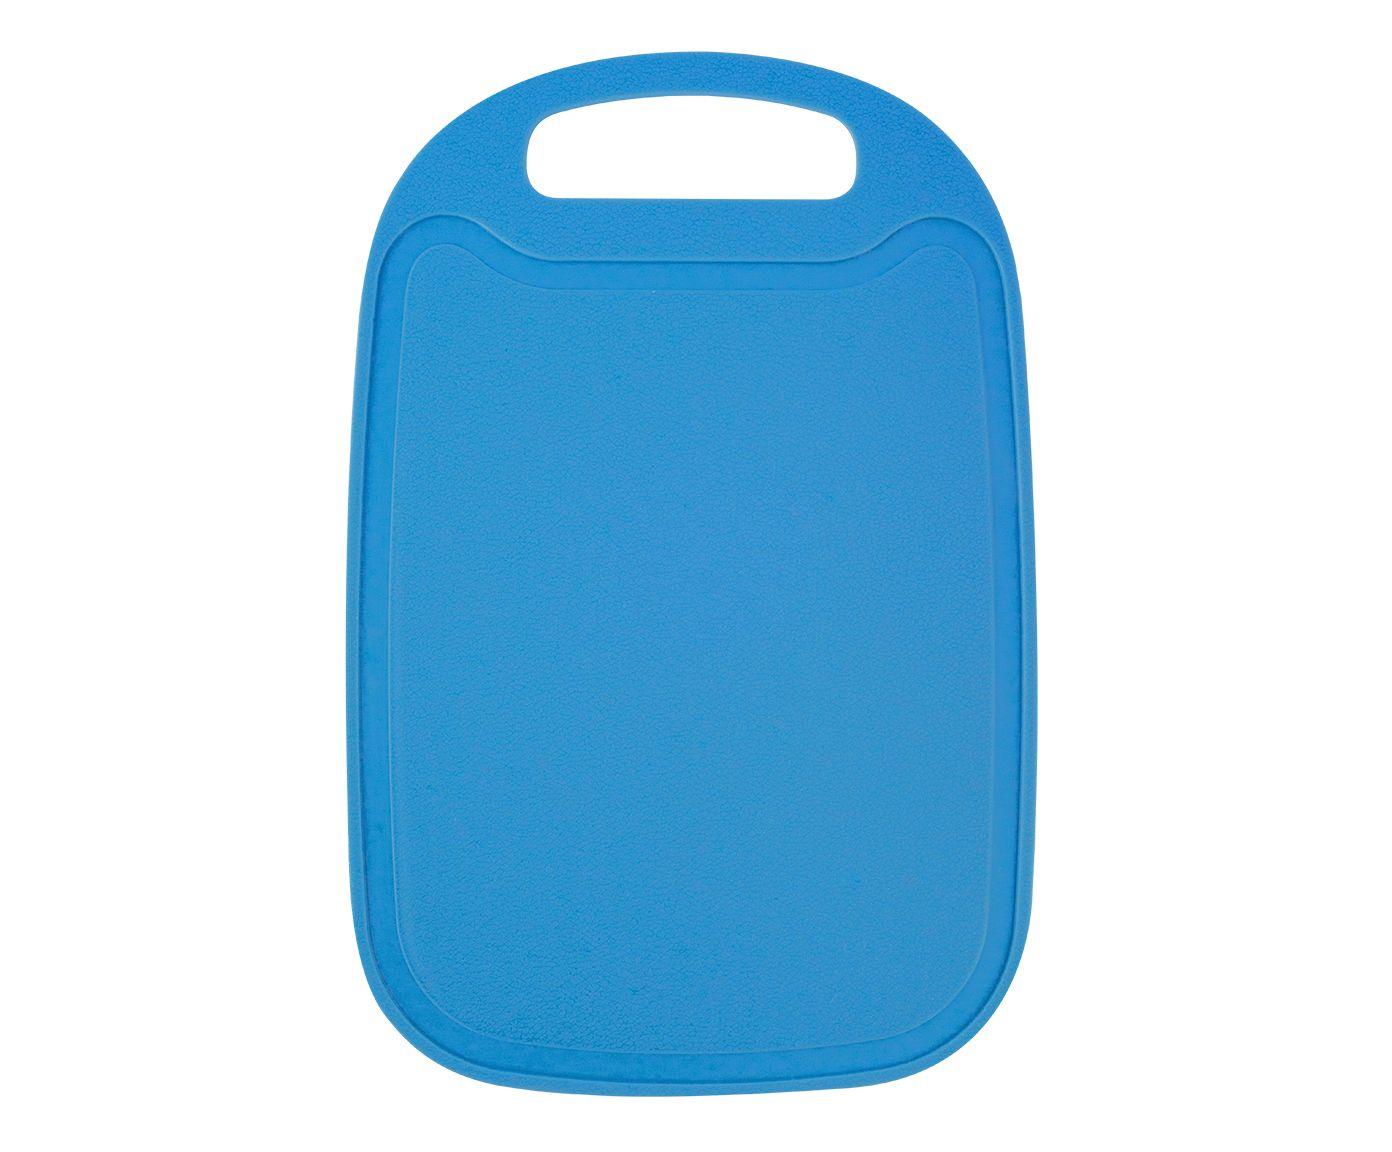 Tábua de Corte Wonderful Azul - 32,5X0,4X22cm   Westwing.com.br